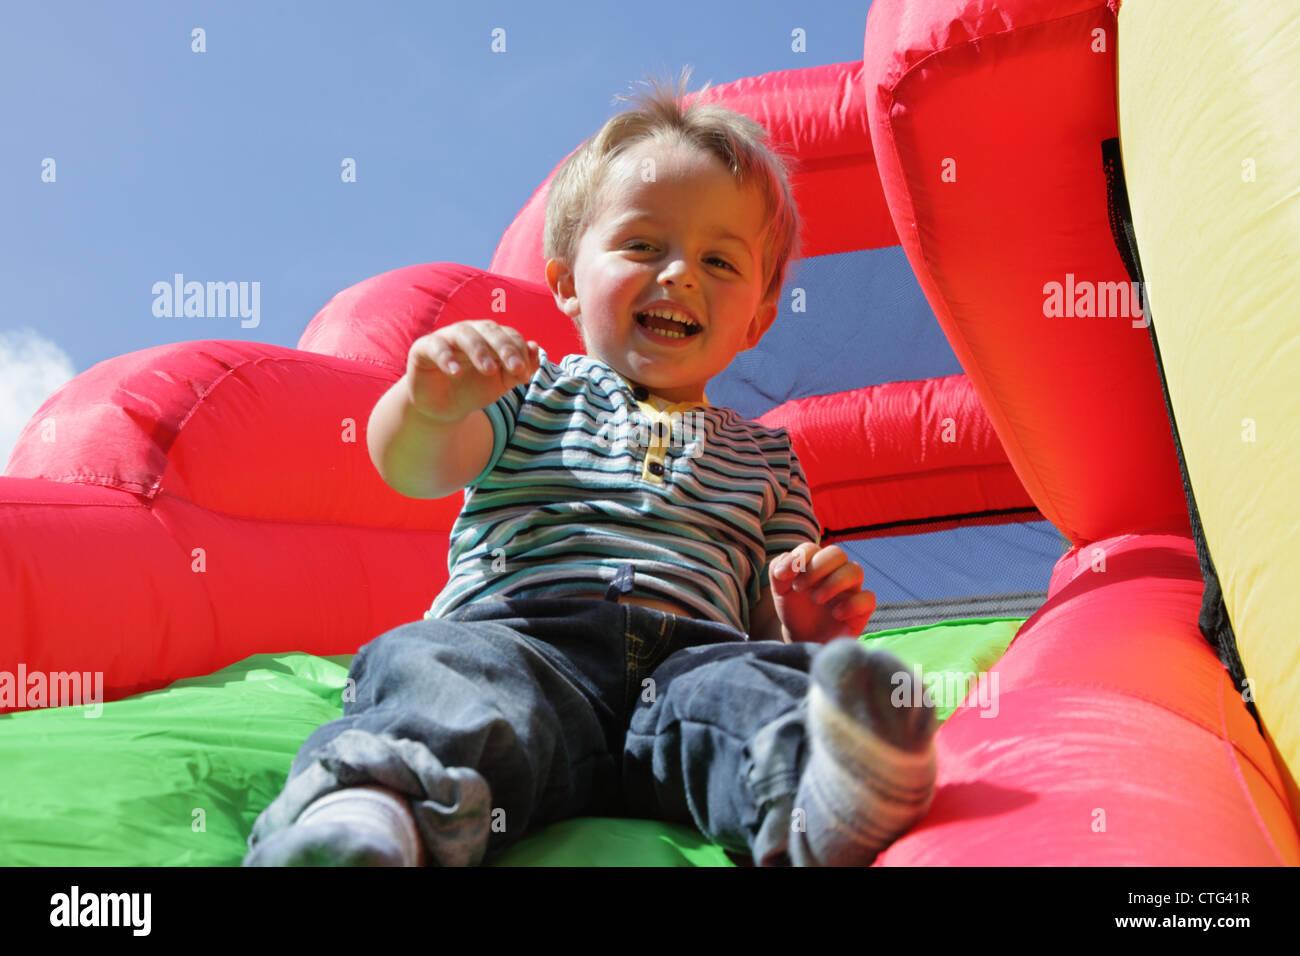 Kind auf aufblasbare Hüpfburg Rutsche Stockbild